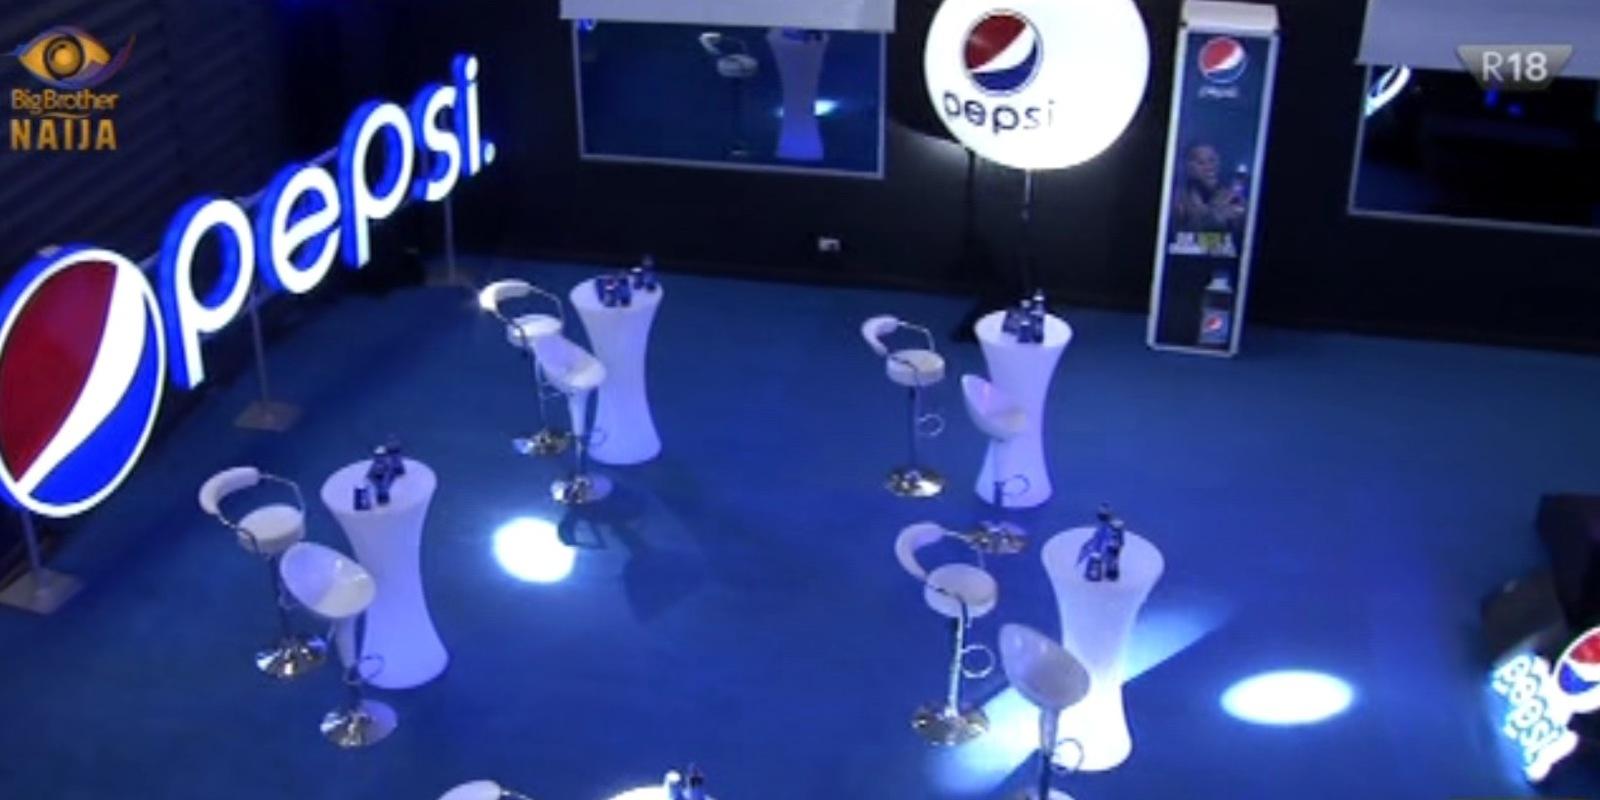 #BBNaija Day – 38: Pepsi Duo Showdown, Midweek Vibe & Puzzling Up